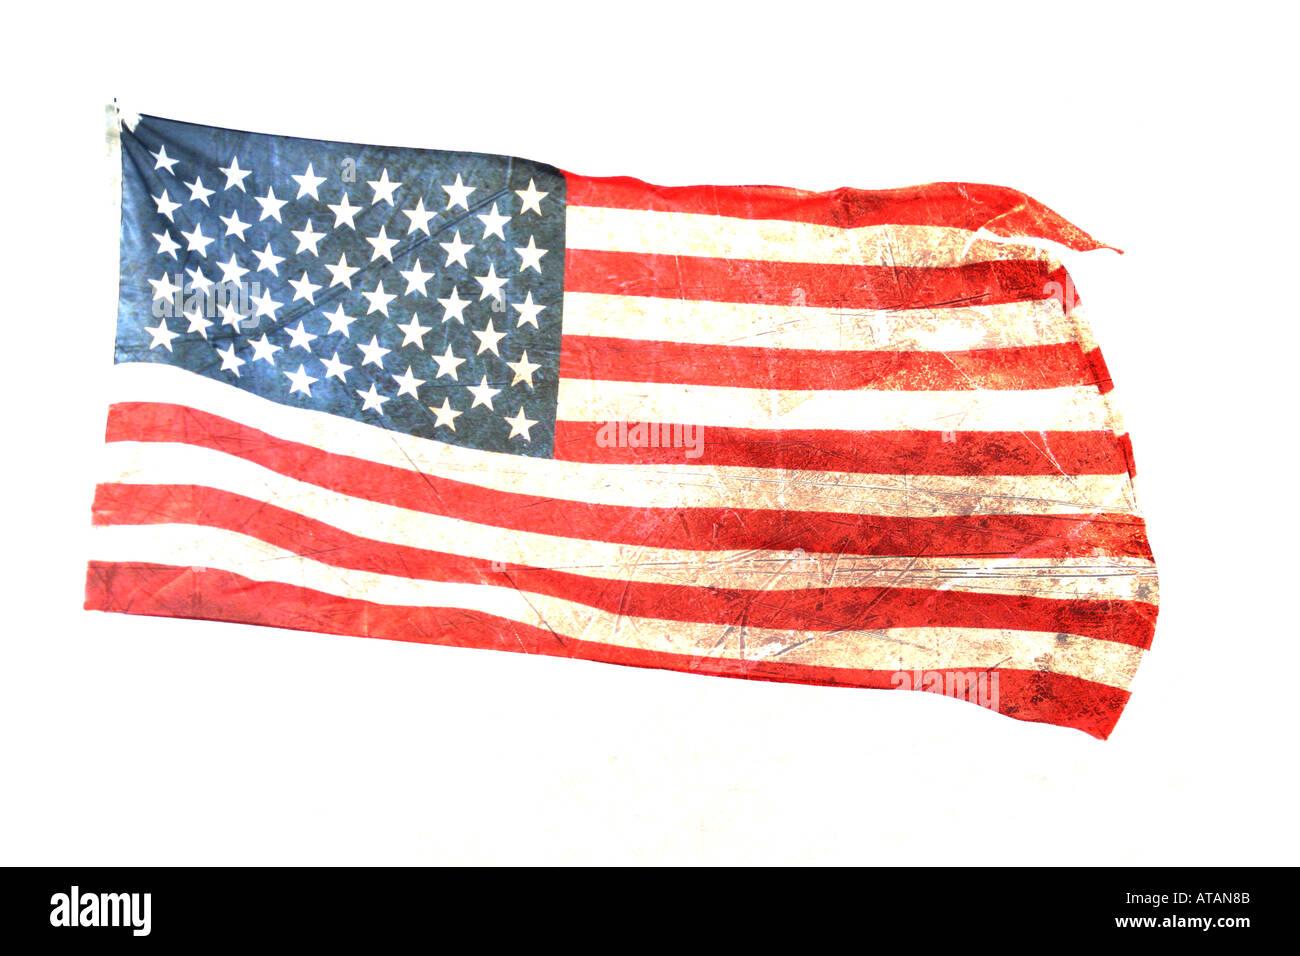 american flag 2 - Stock Image